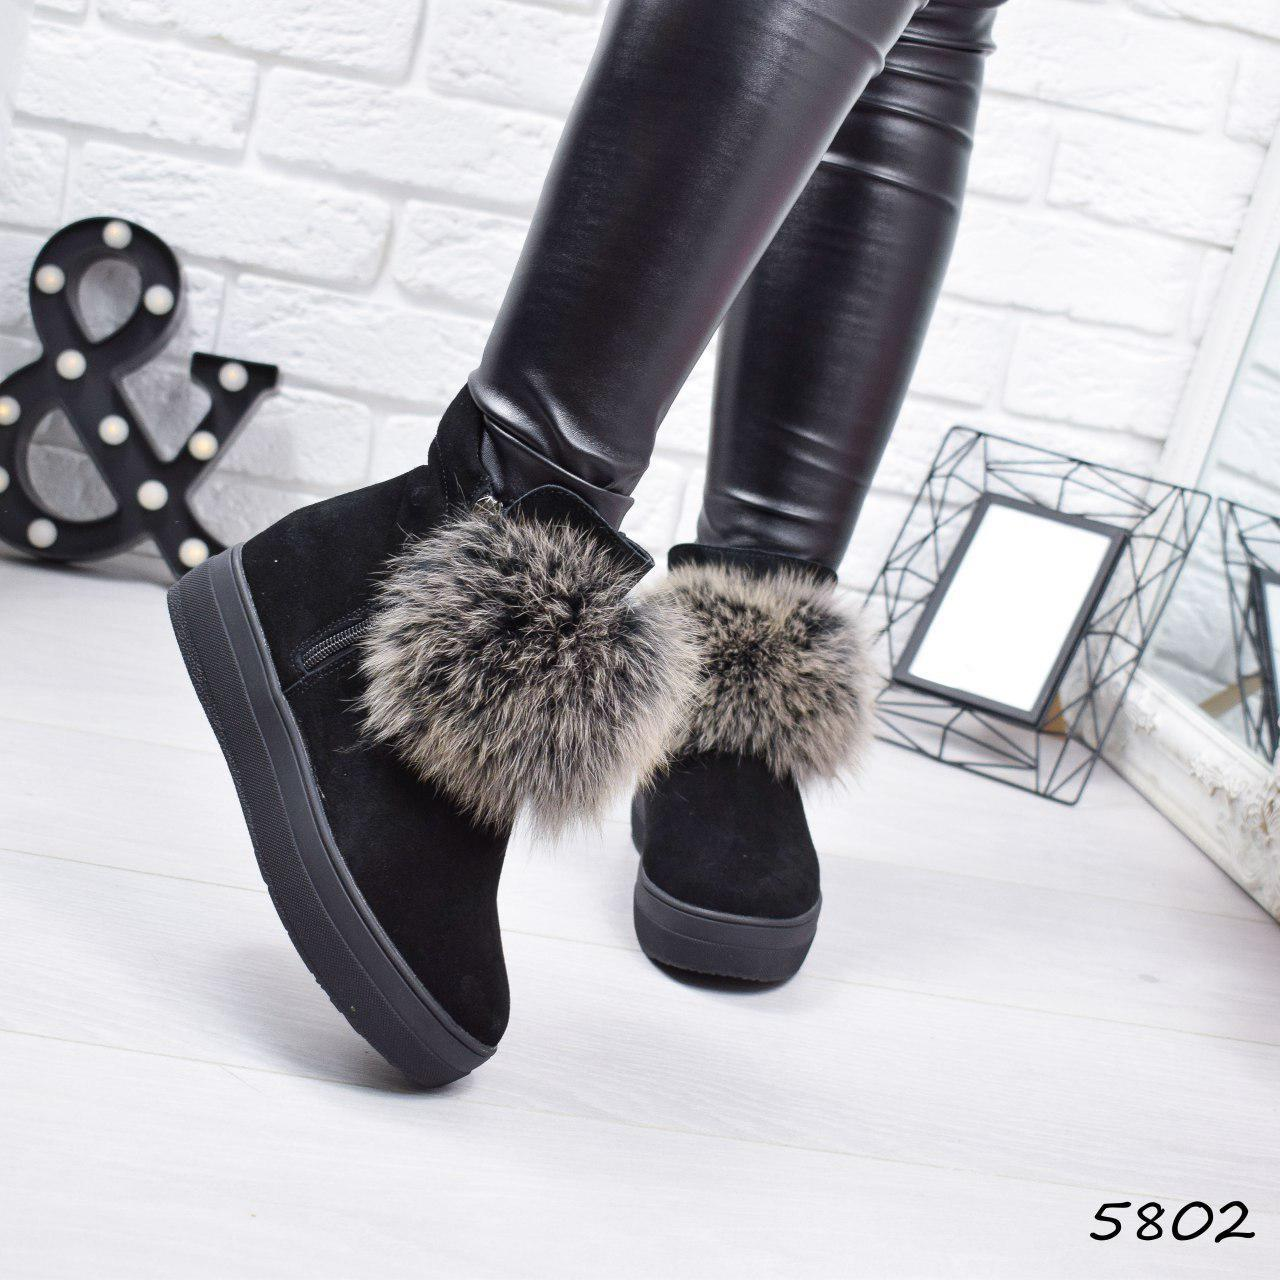 "Ботинки черные, на танкетке ЗИМА ""Marge"" НАТУРАЛЬНАЯ ЗАМША, повседневная, зимняя, теплая, женская обувь"